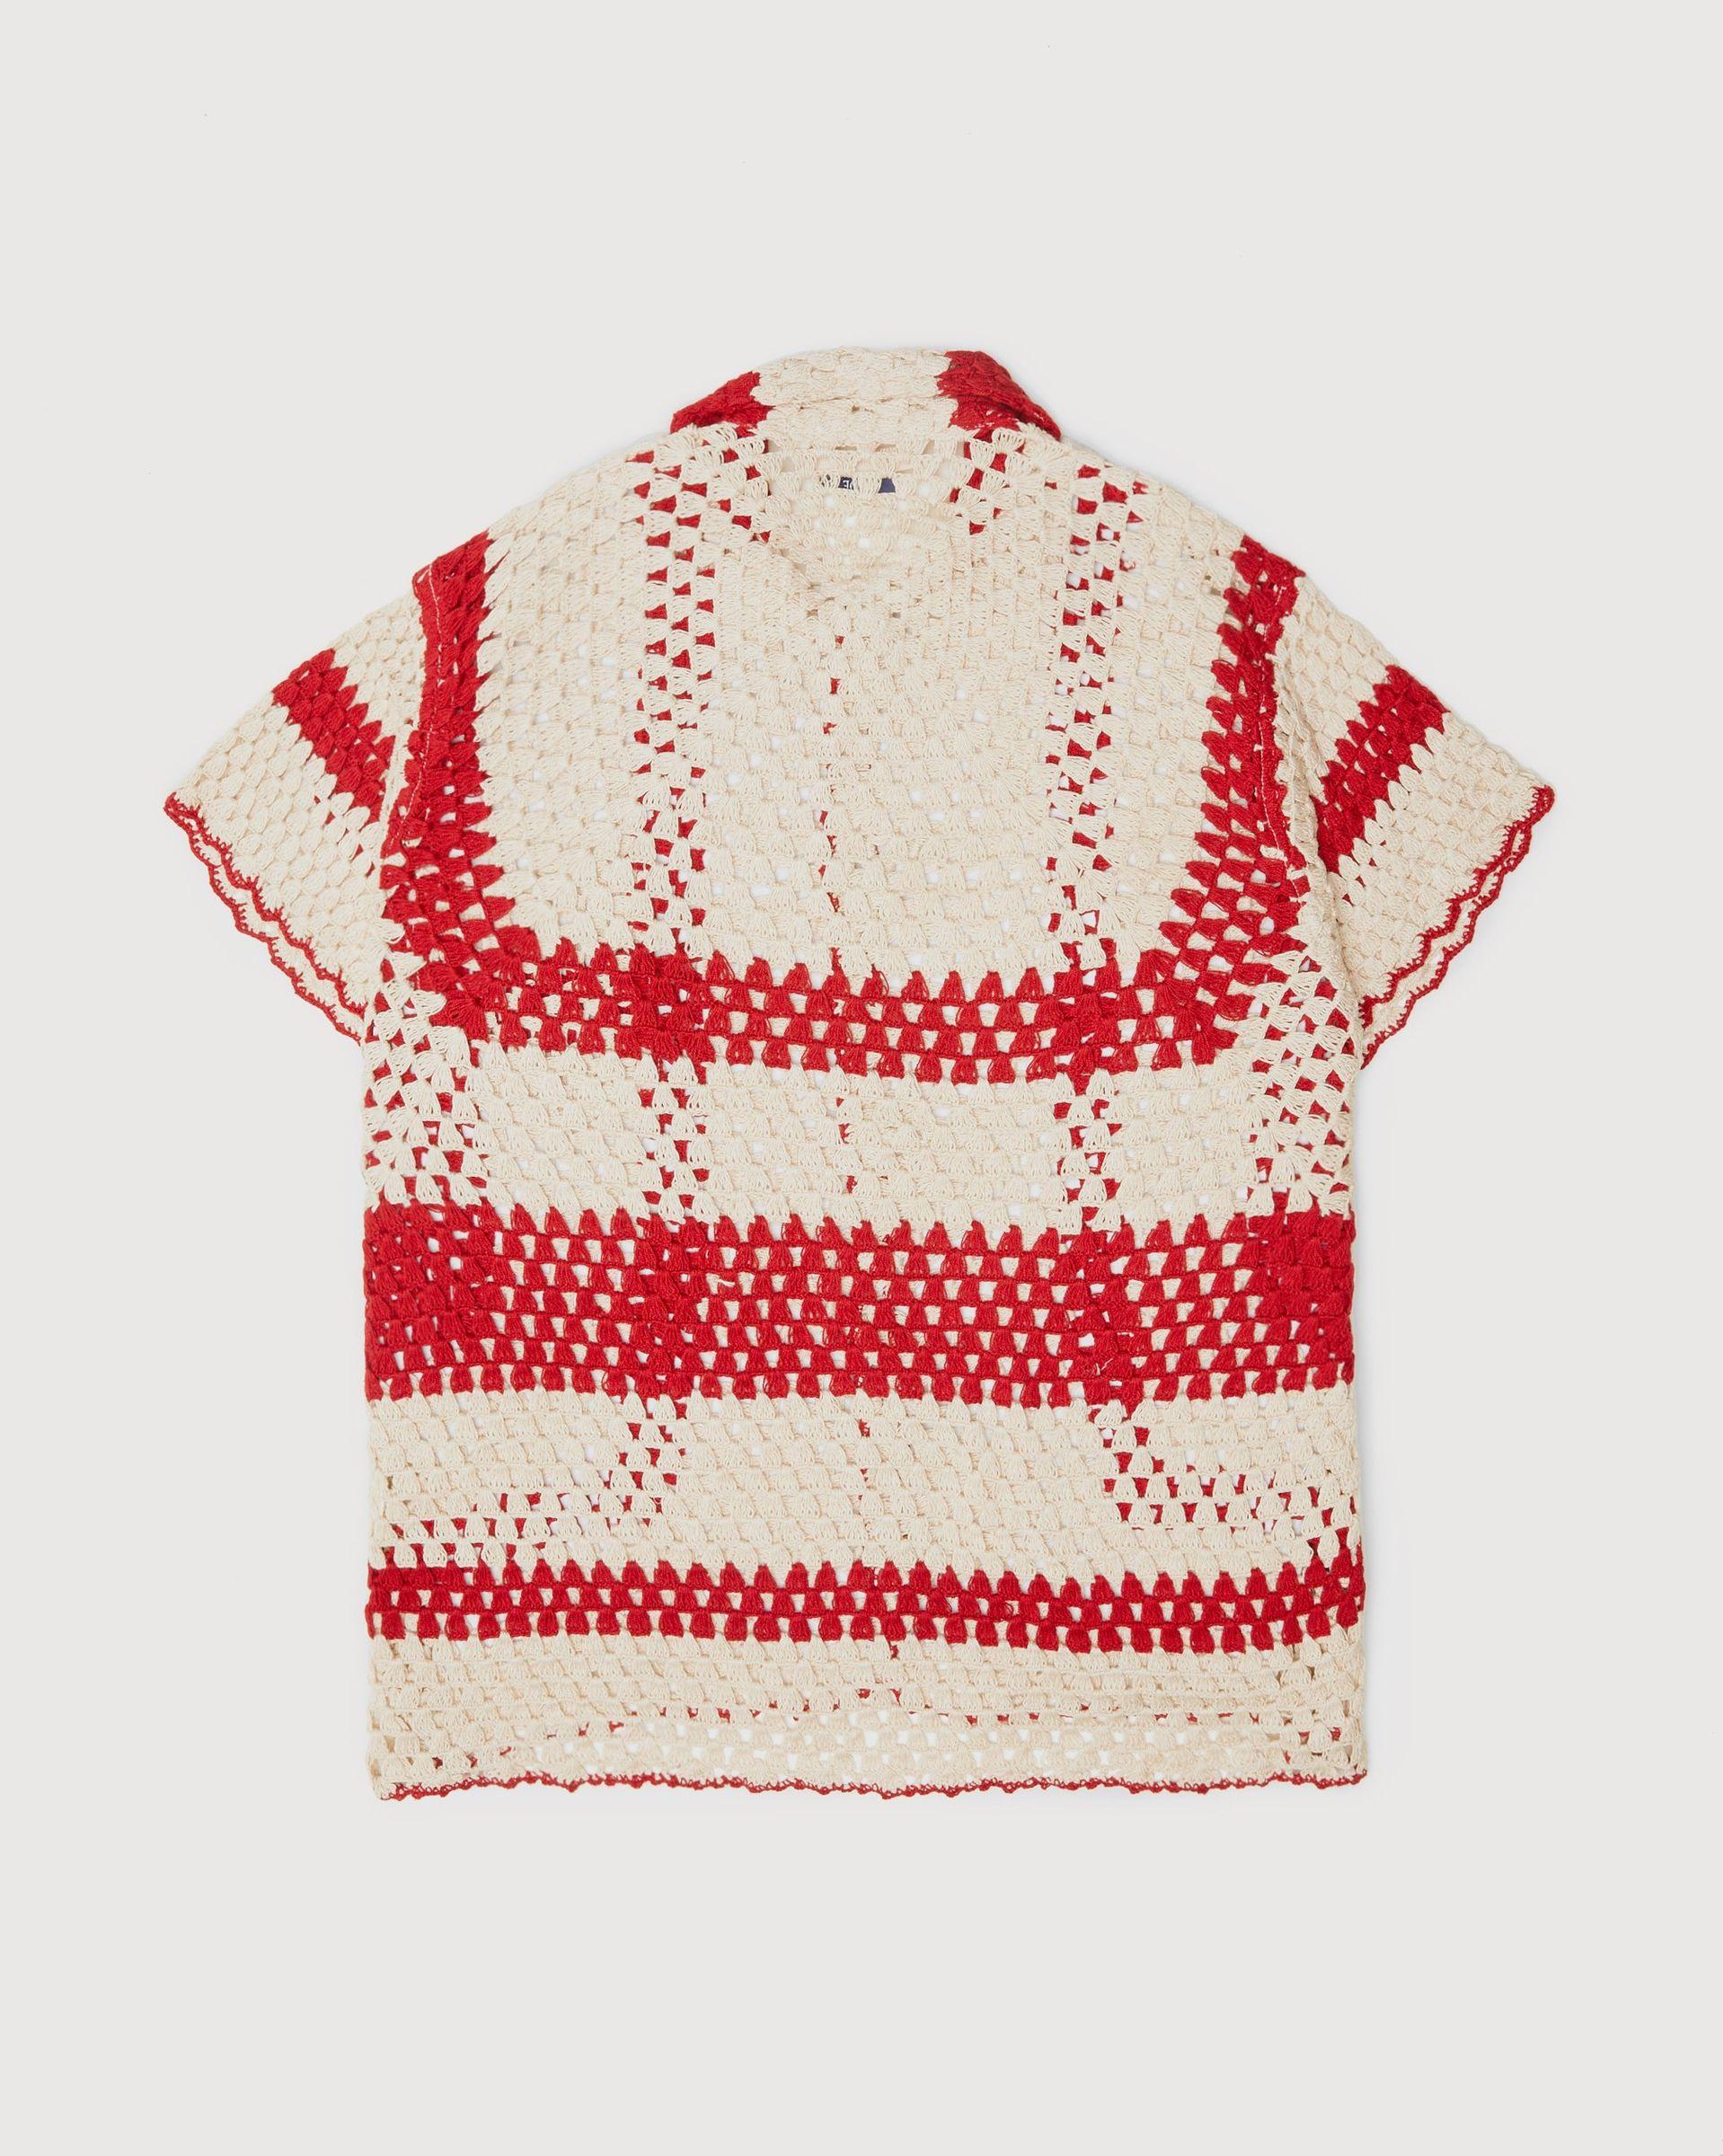 BODE - Crochet Big Top Shirt White Red - Image 2